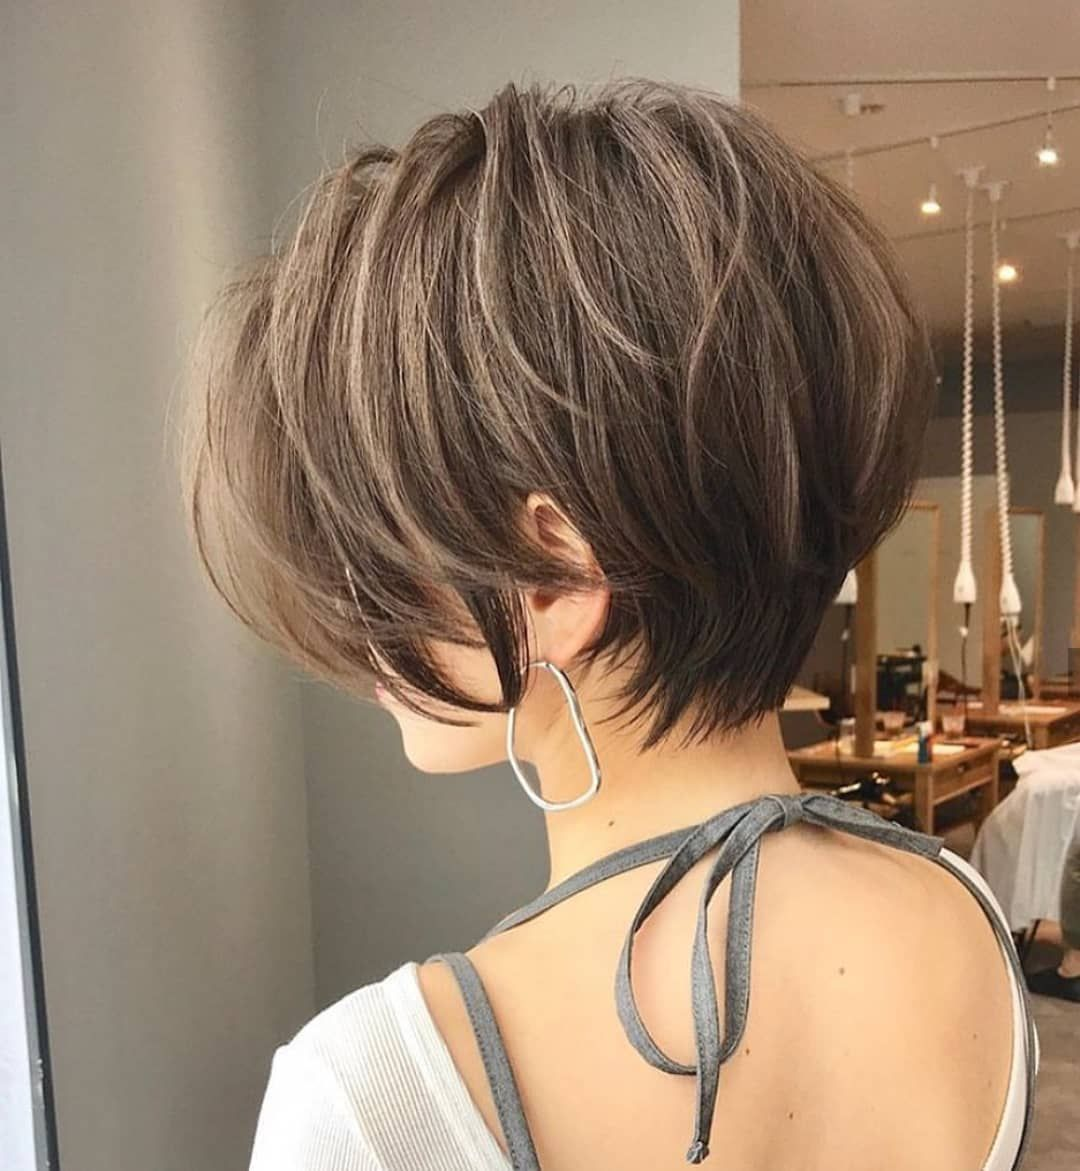 "Photo of Short hairstyles on Instagram: ""Wowww 💕 @ gien_issei #kurzehaare # frisuren2020 # hair dyeing #bob haircut #pixiehaircut"""